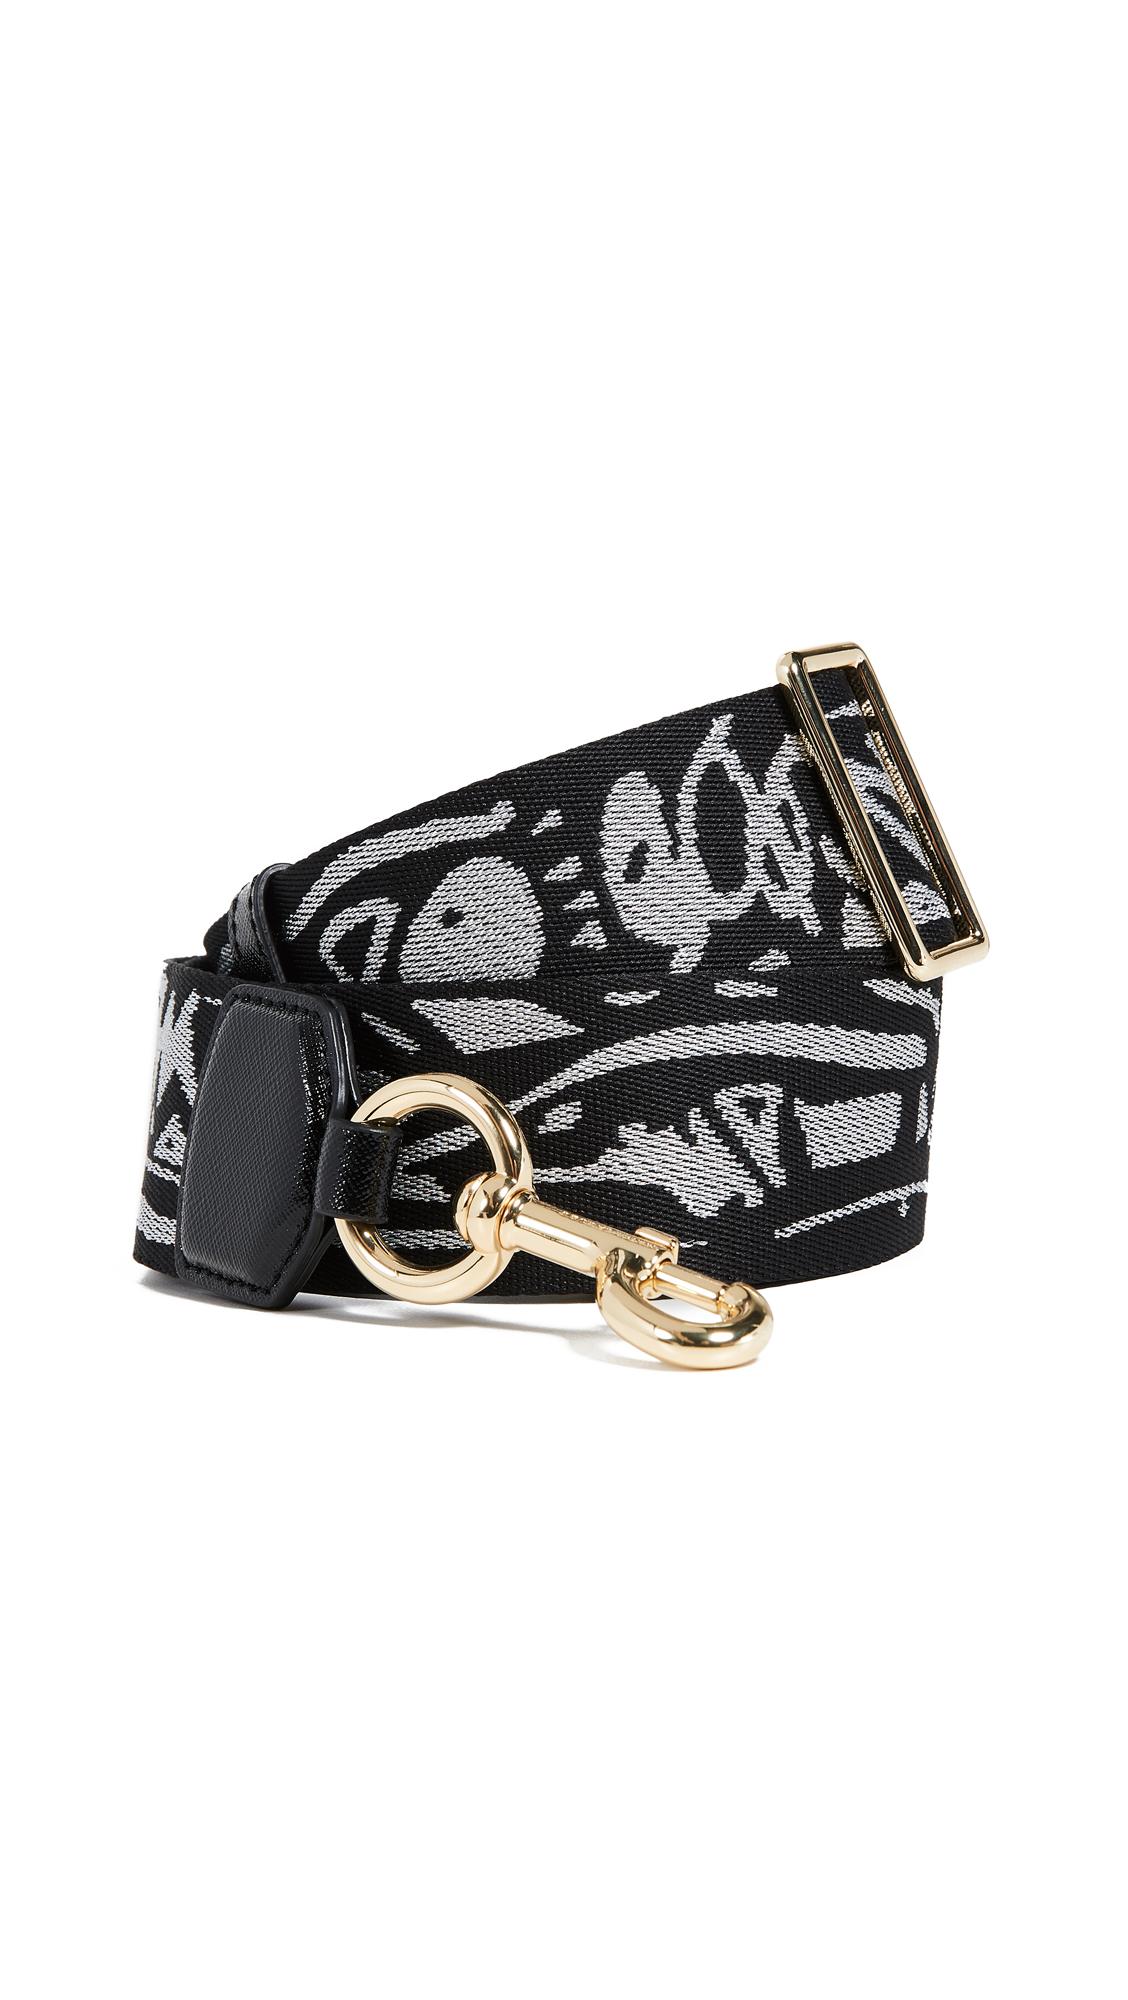 Marc Jacobs Graffiti Webbing Handbag Strap In Black Multi